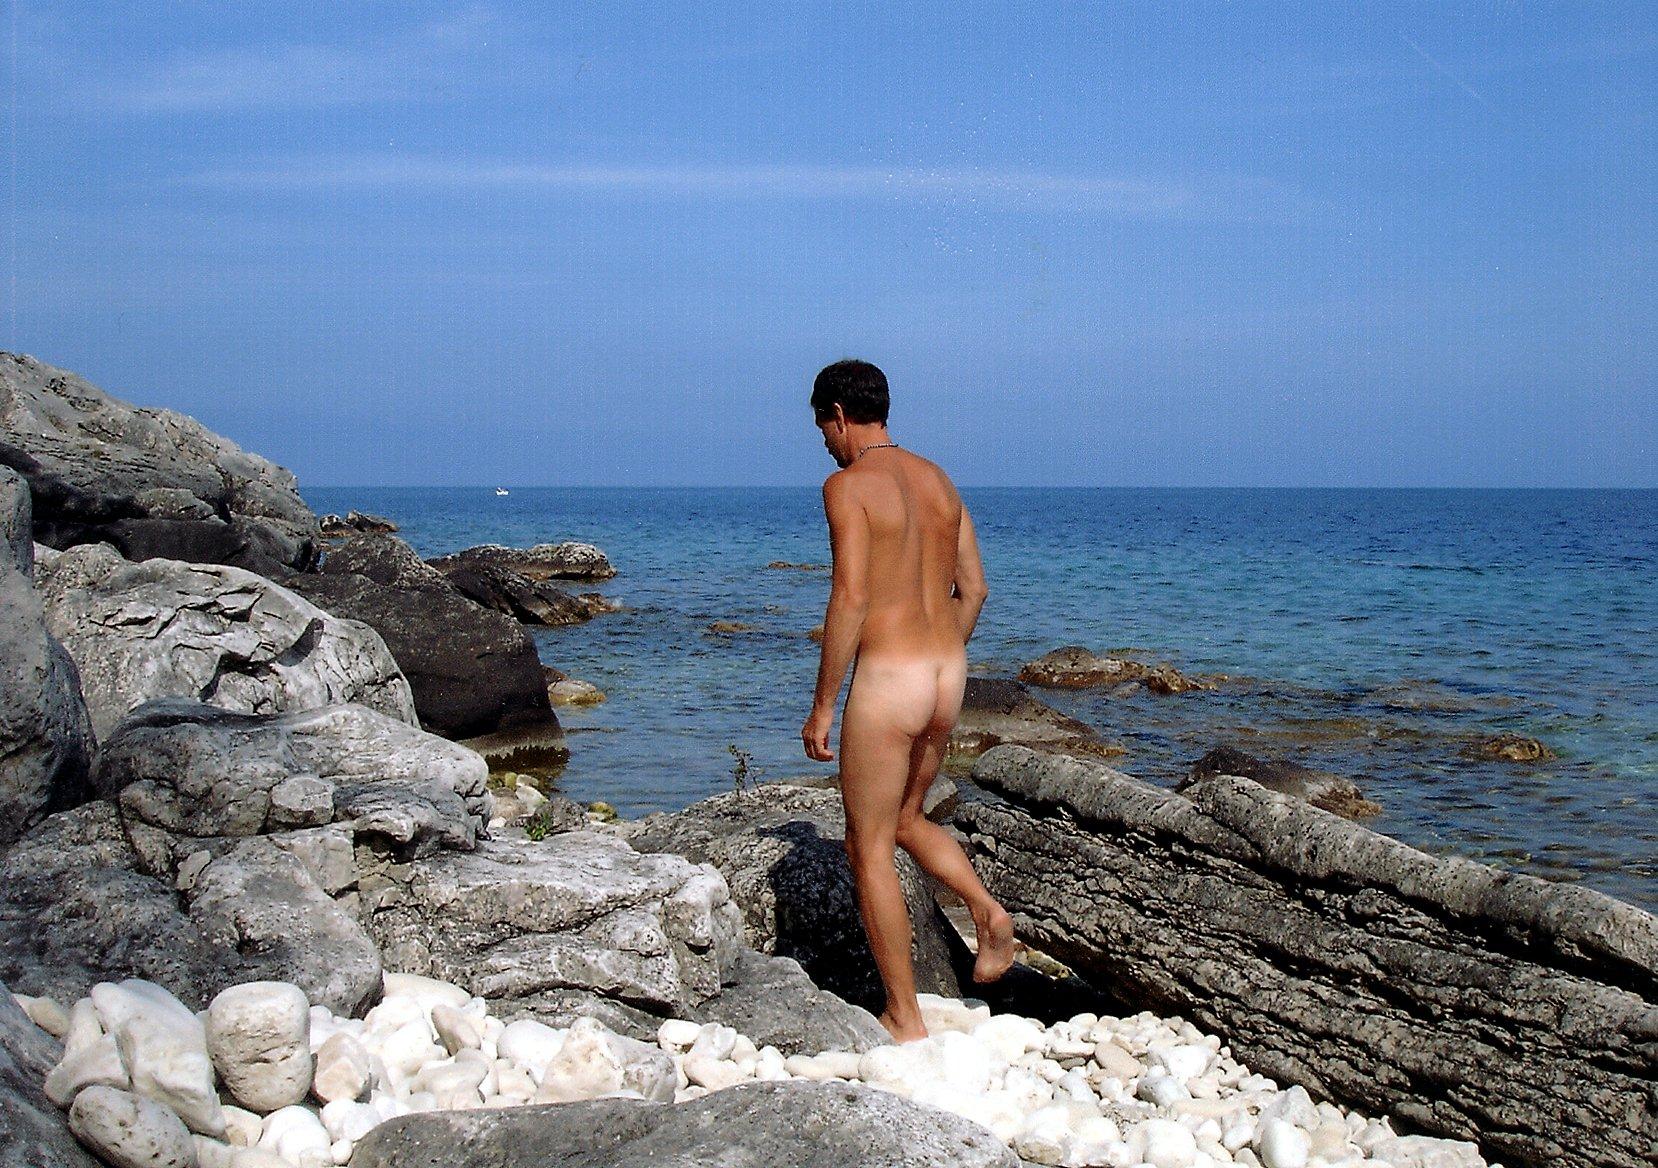 Swimwear for nude beaches